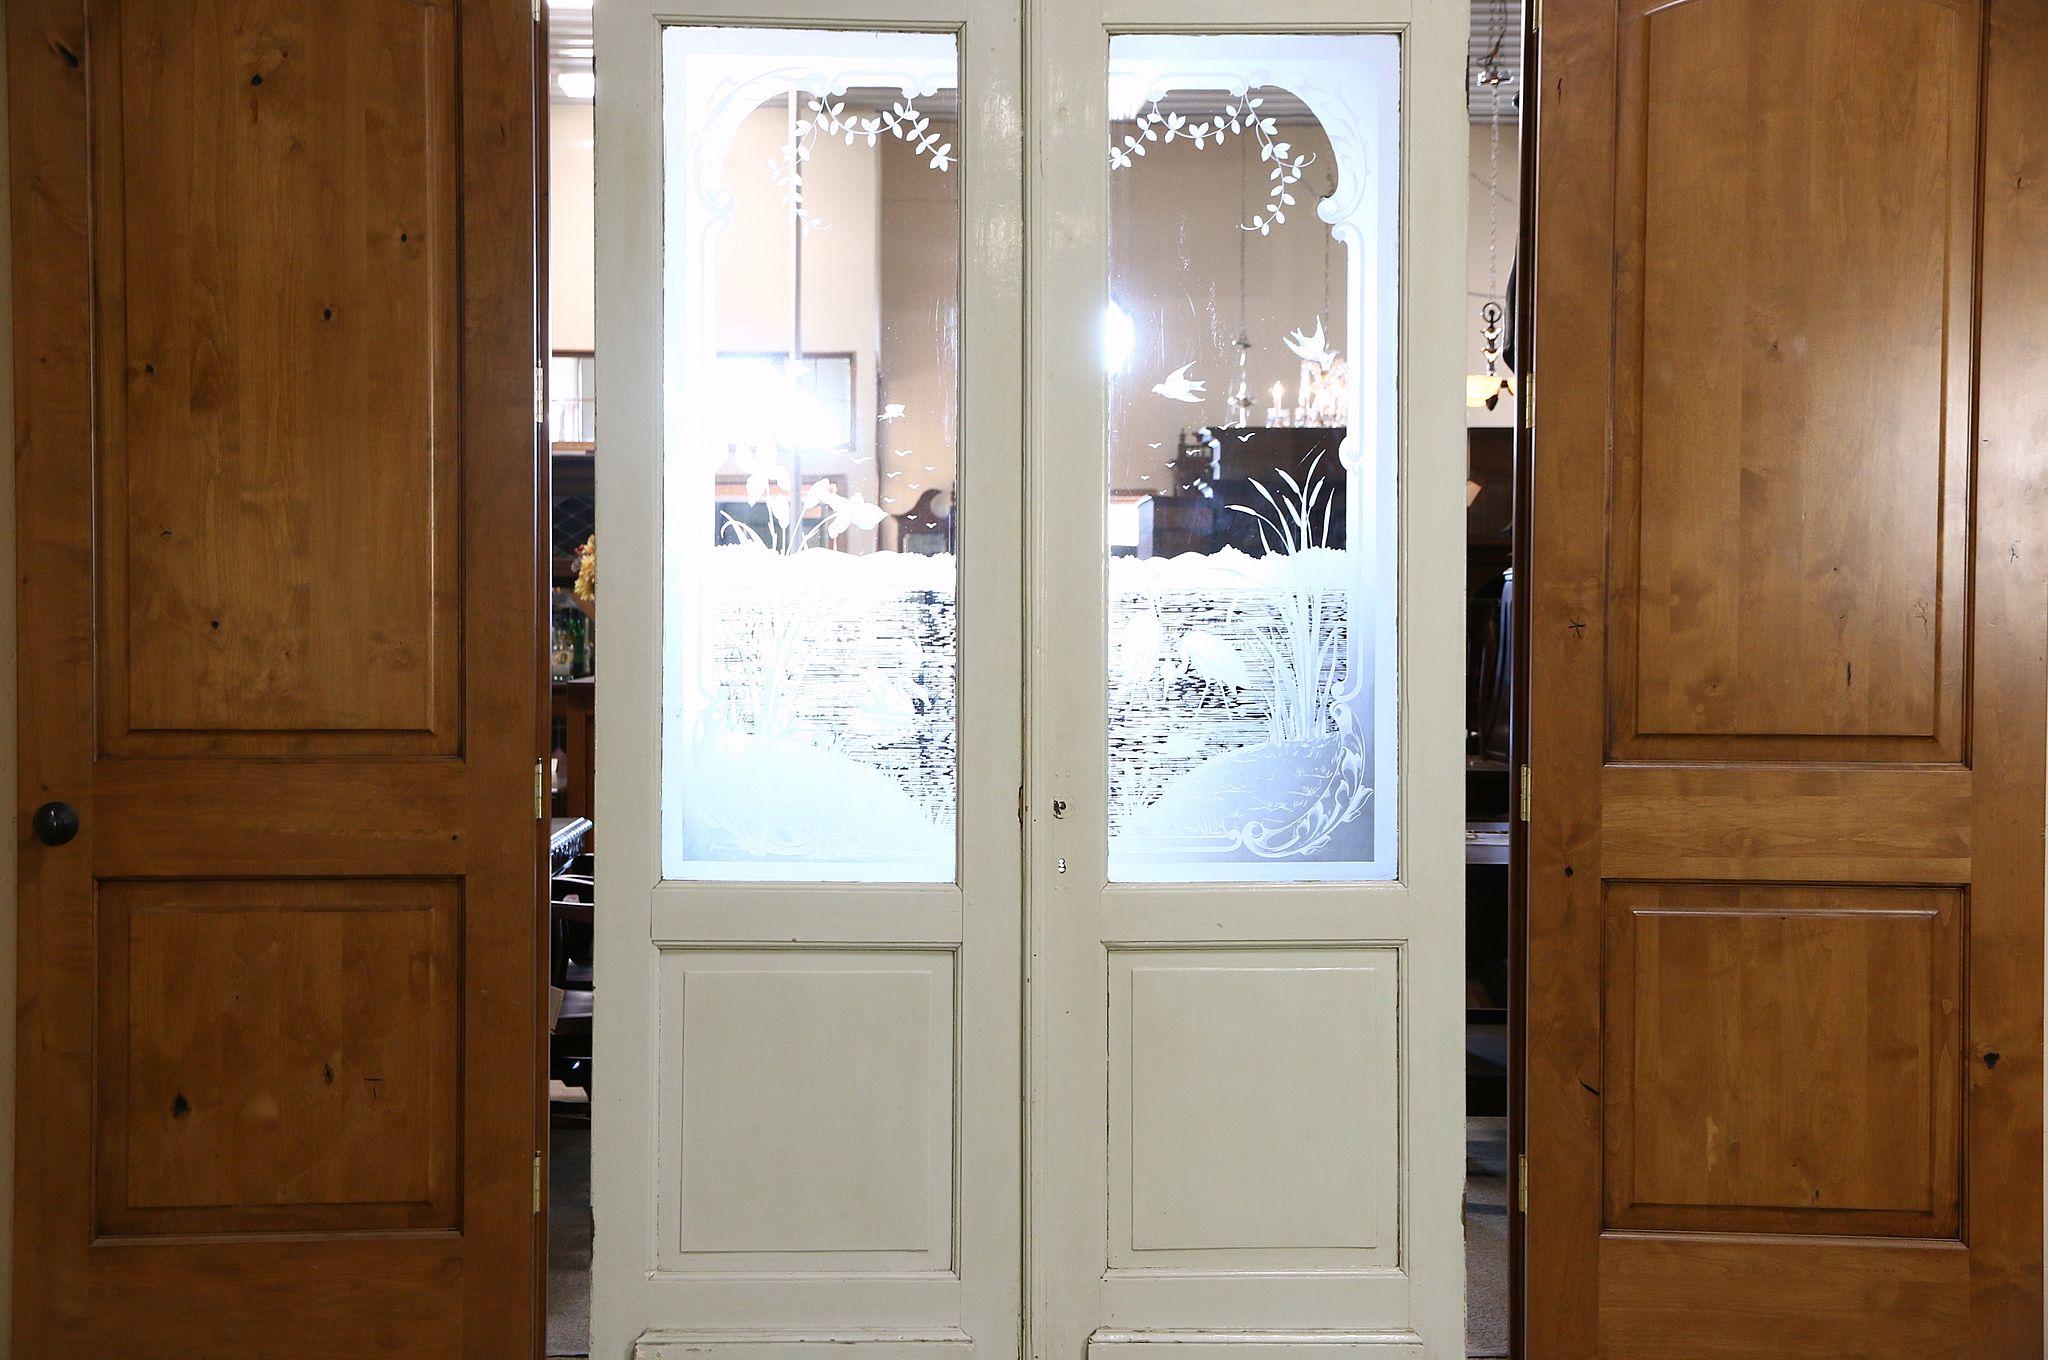 Pair 1890u0027s Antique Salvage Doors Etched Swan u0026 Crane Scene Windows & SOLD - Pair 1890u0027s Antique Salvage Doors Etched Swan u0026 Crane Scene ...